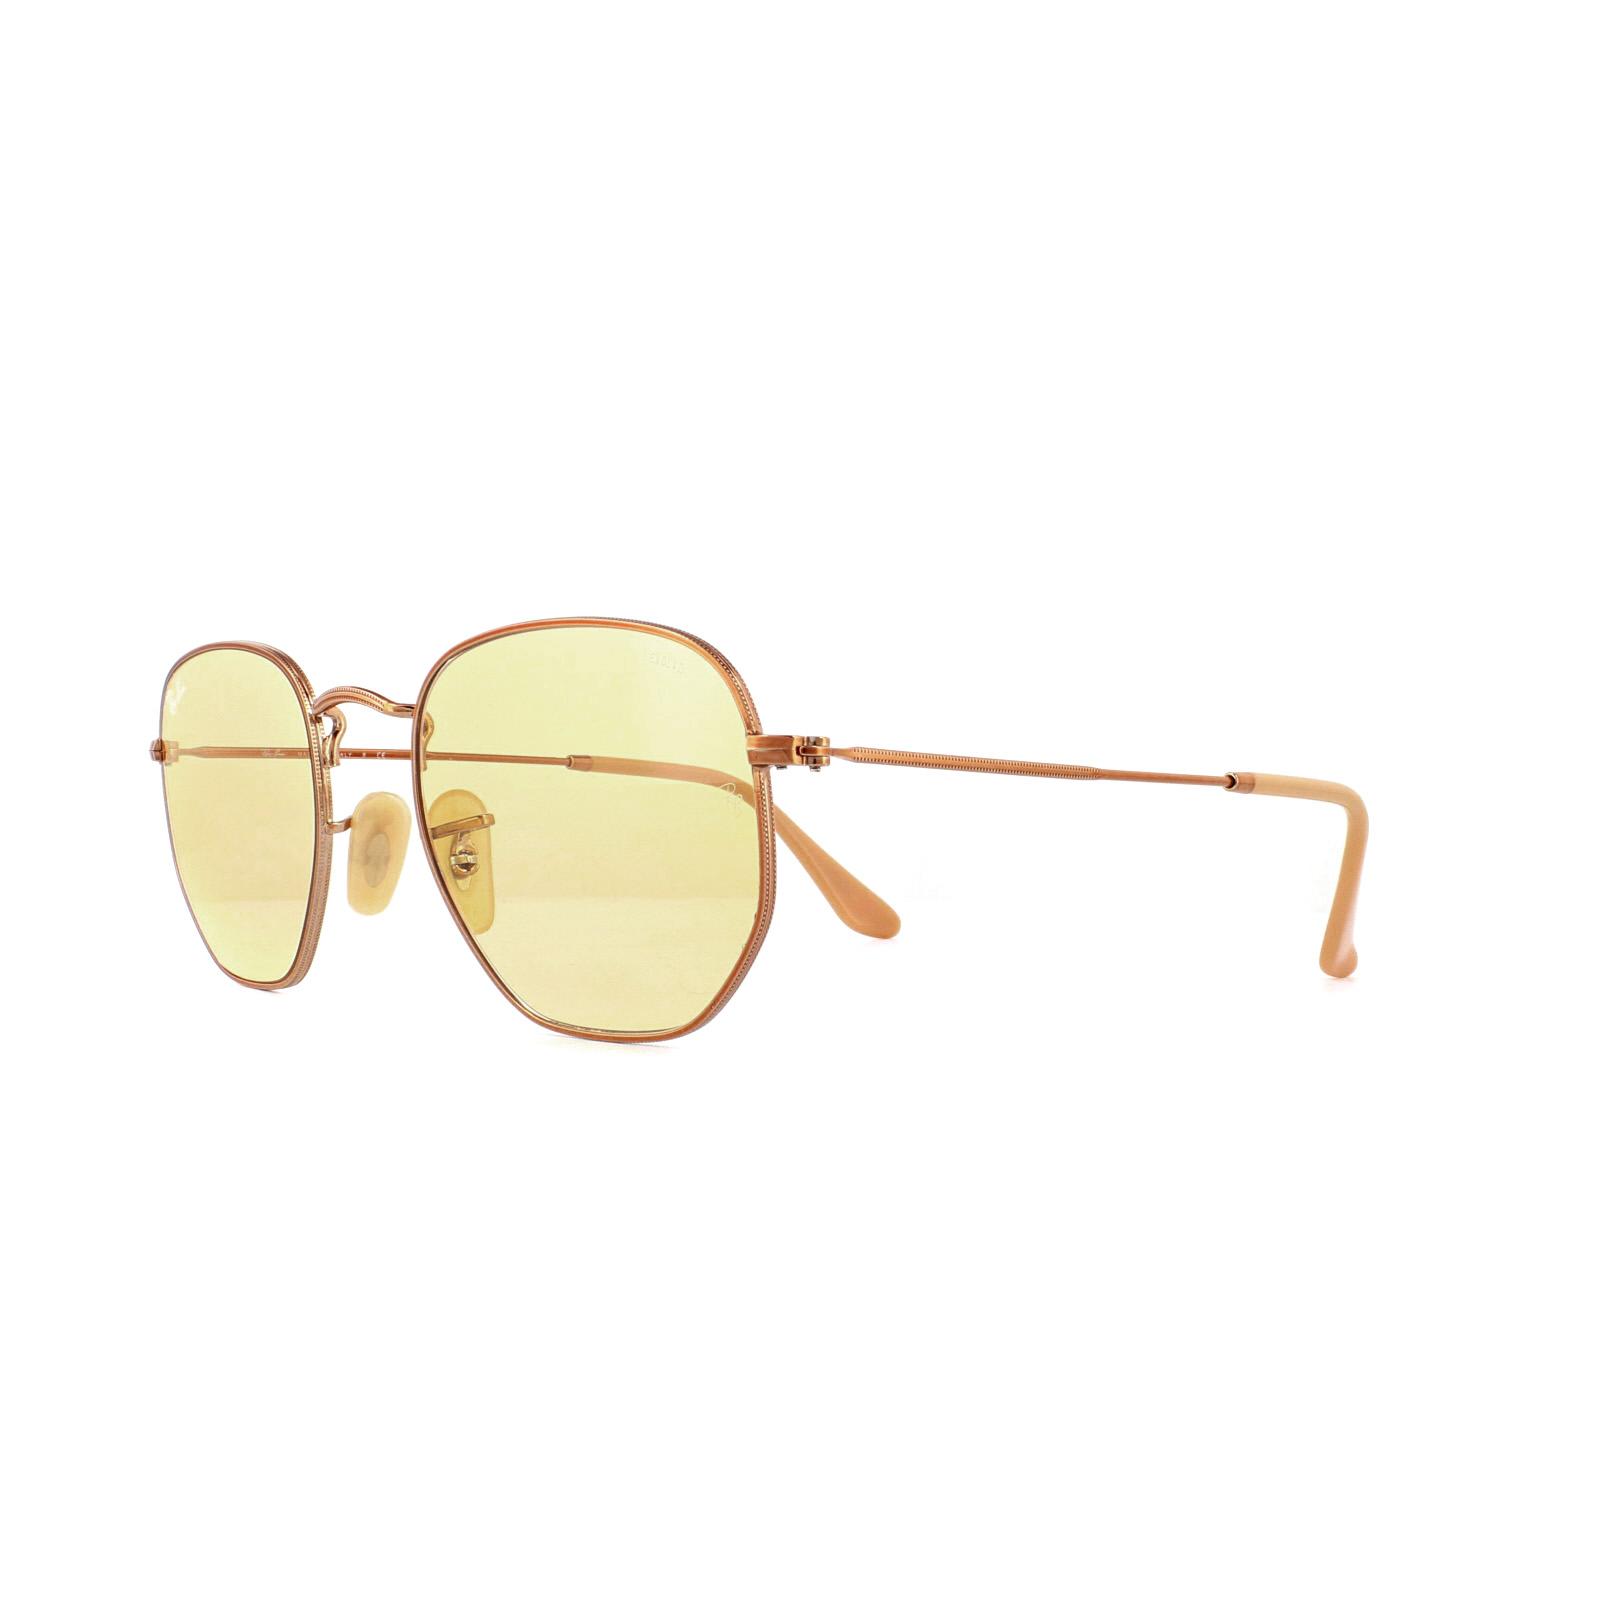 523c231eaf3 Sentinel Ray-Ban Sunglasses Hexagonal 3548N 91310Z Copper Light Yellow 51mm